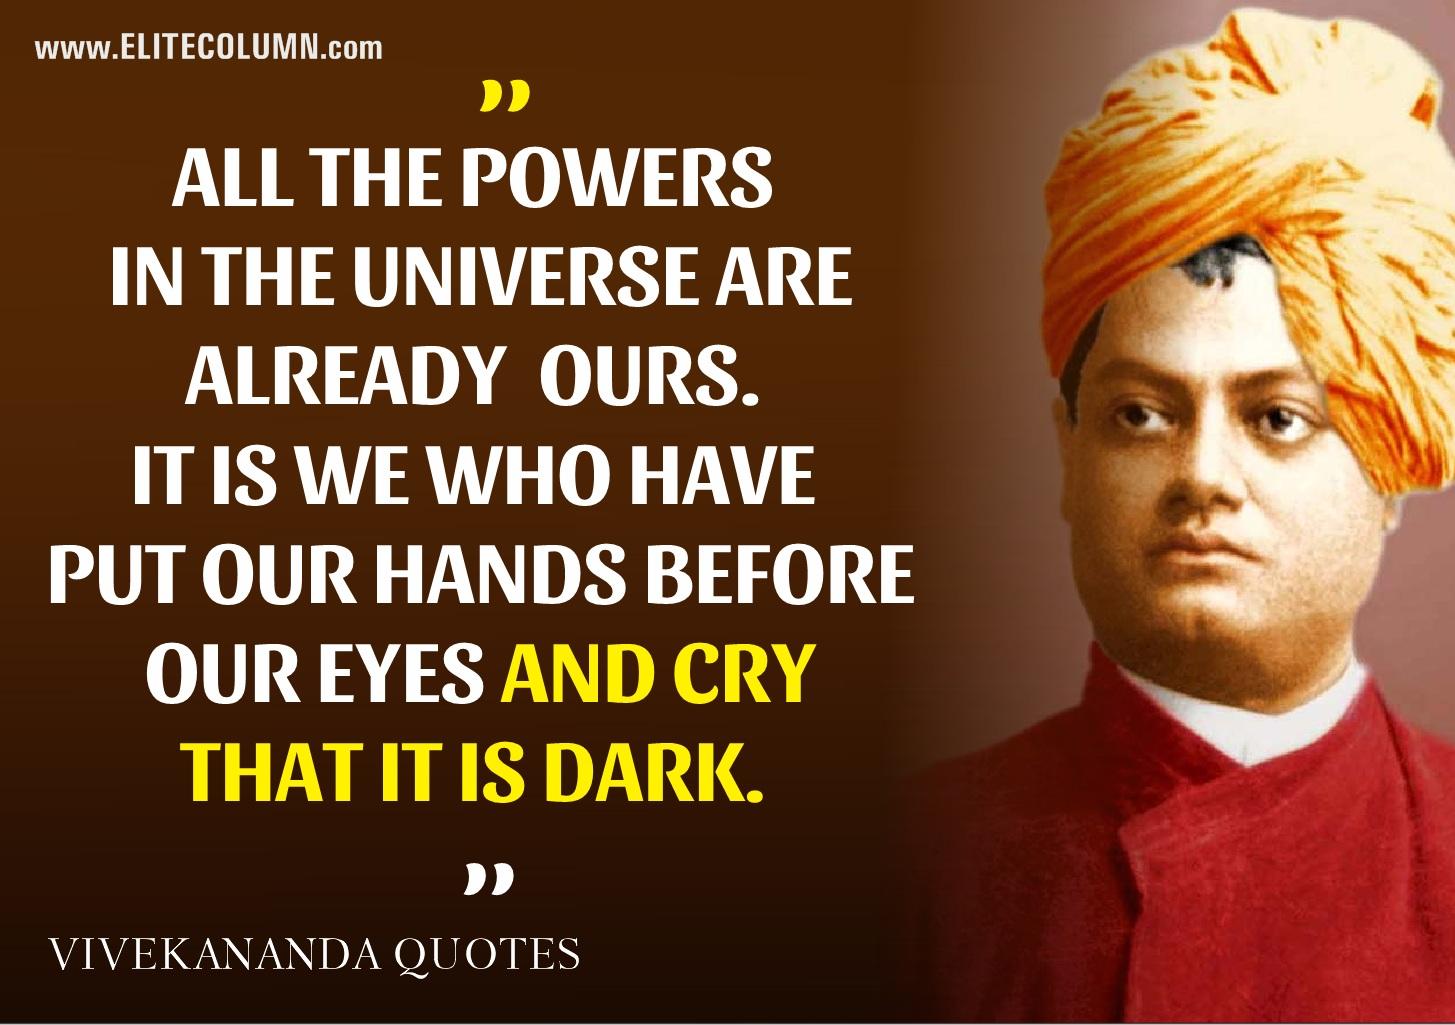 Vivekananda Quotes (2)